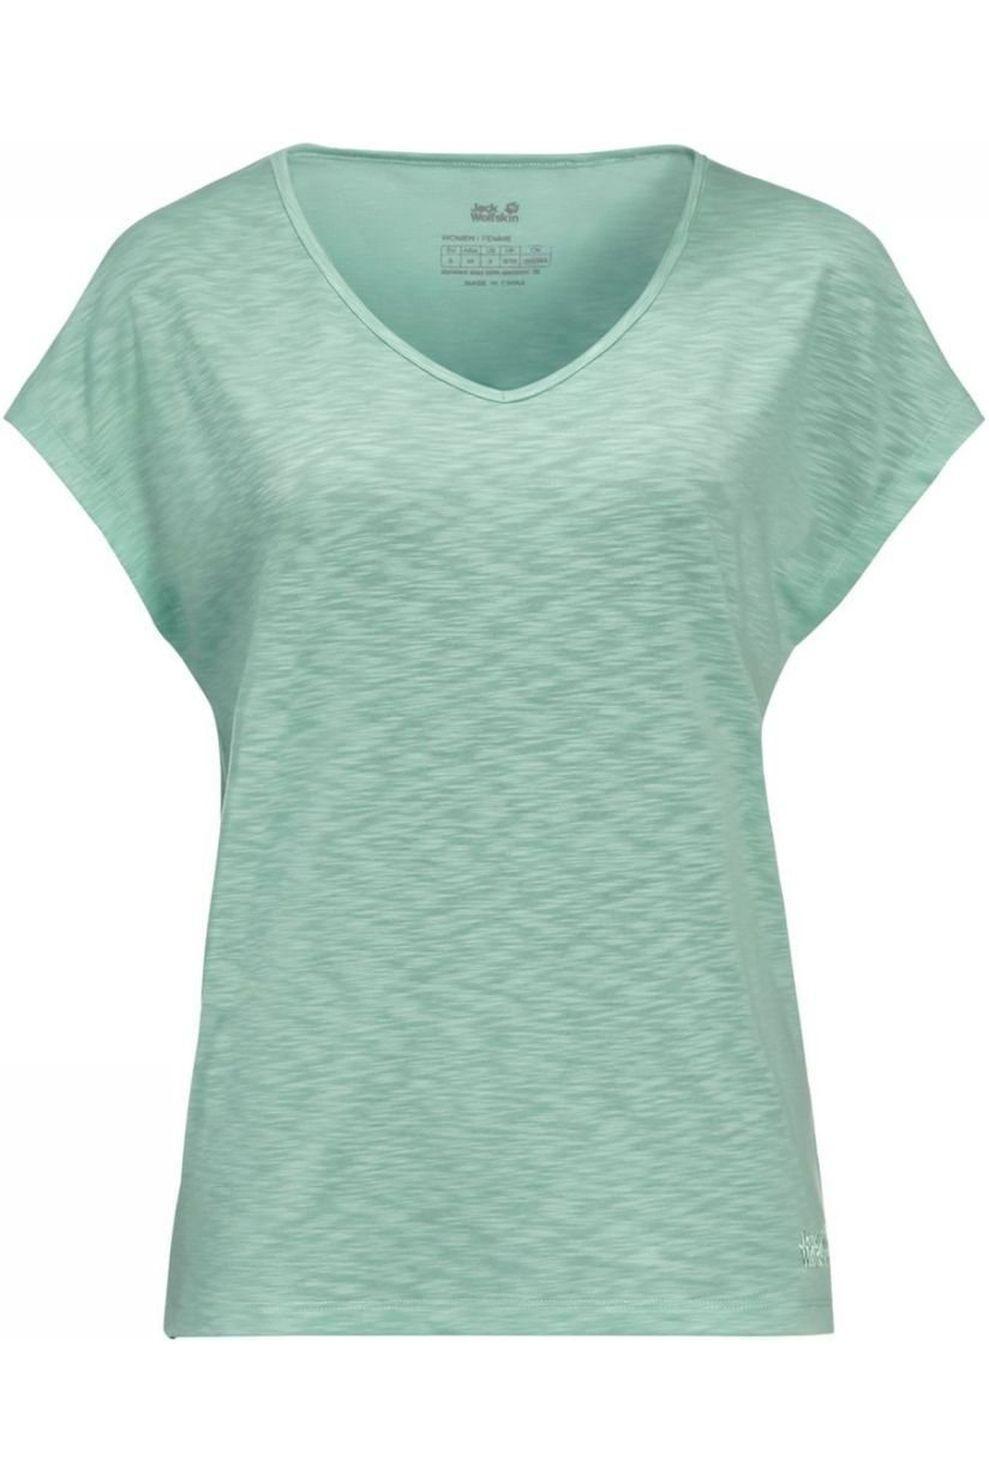 Jack Wolfskin T-Shirt Travel T voor dames - Blauw - Maten: XS, S, M, L, XL, XXL